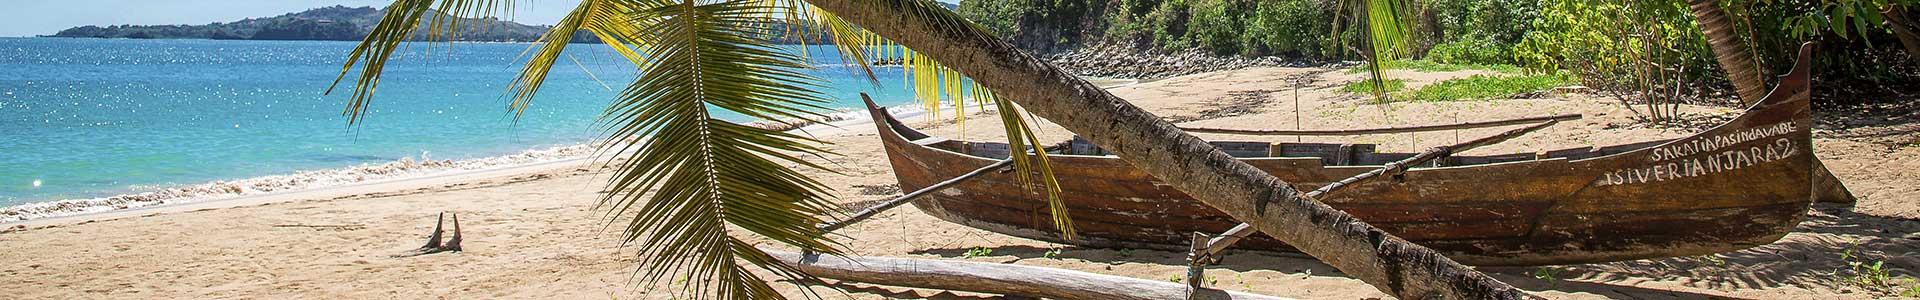 Voyage à Madagascar - TUI